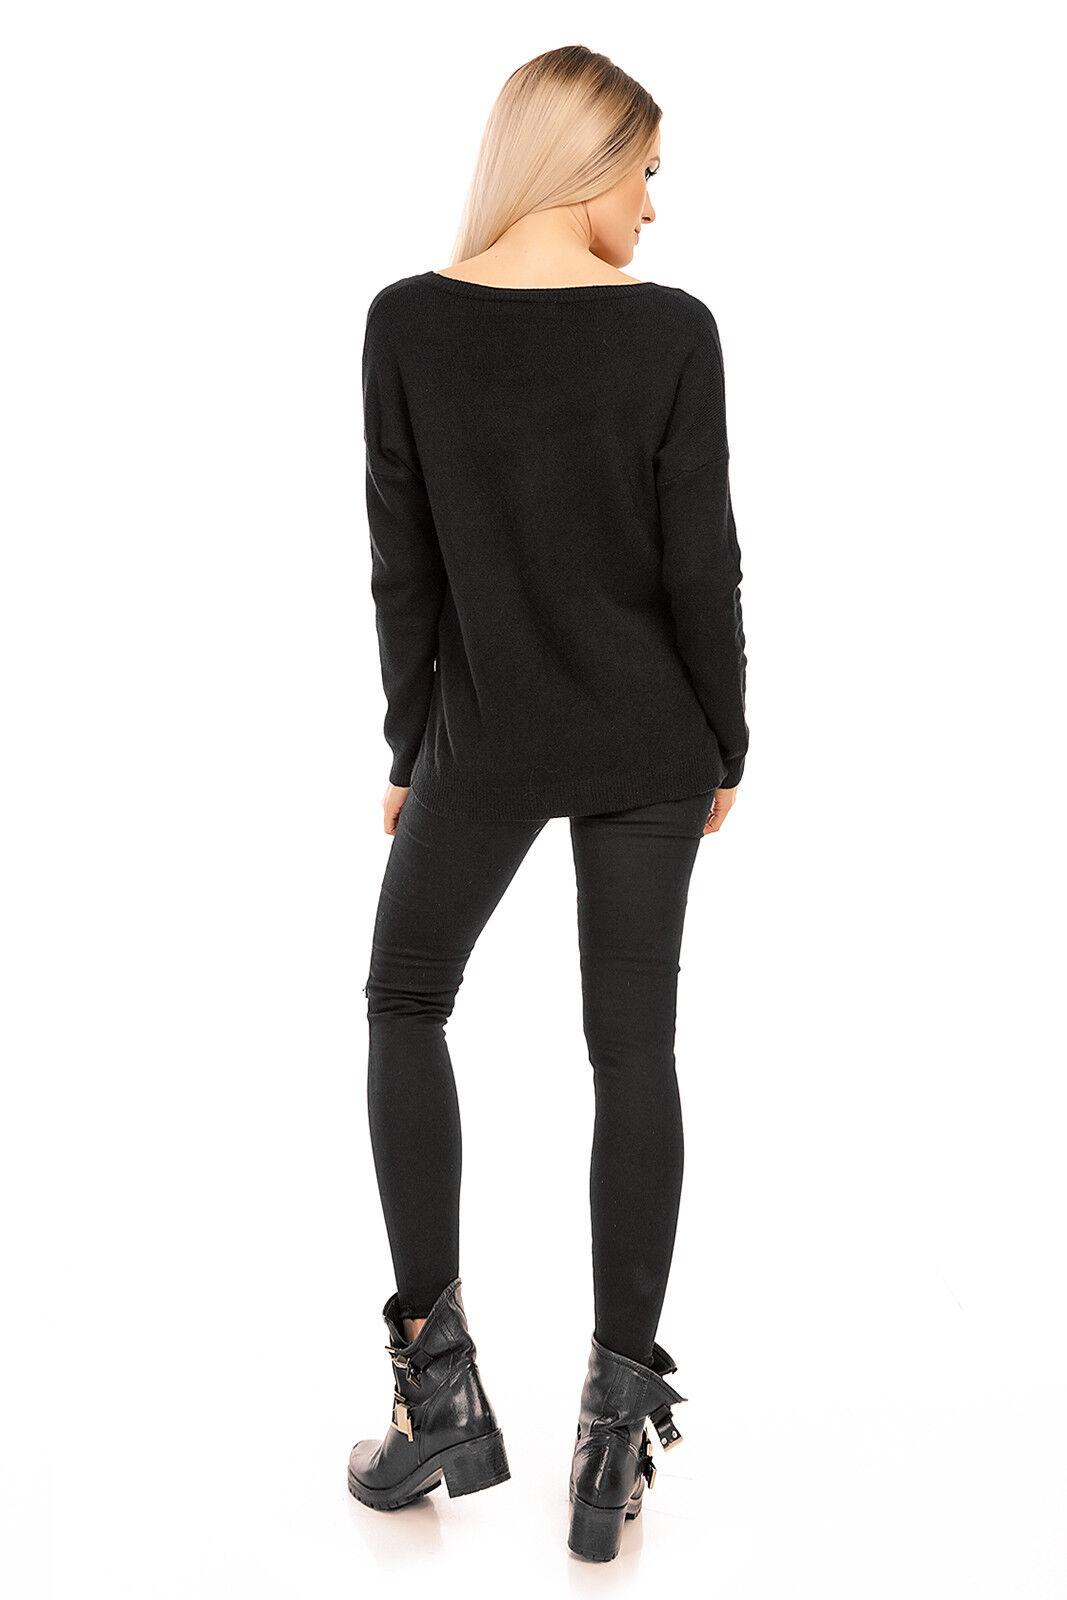 Pullover Sweater Feinstrick Cardigan Jacke Pulli Shirt Jumper Longpullover